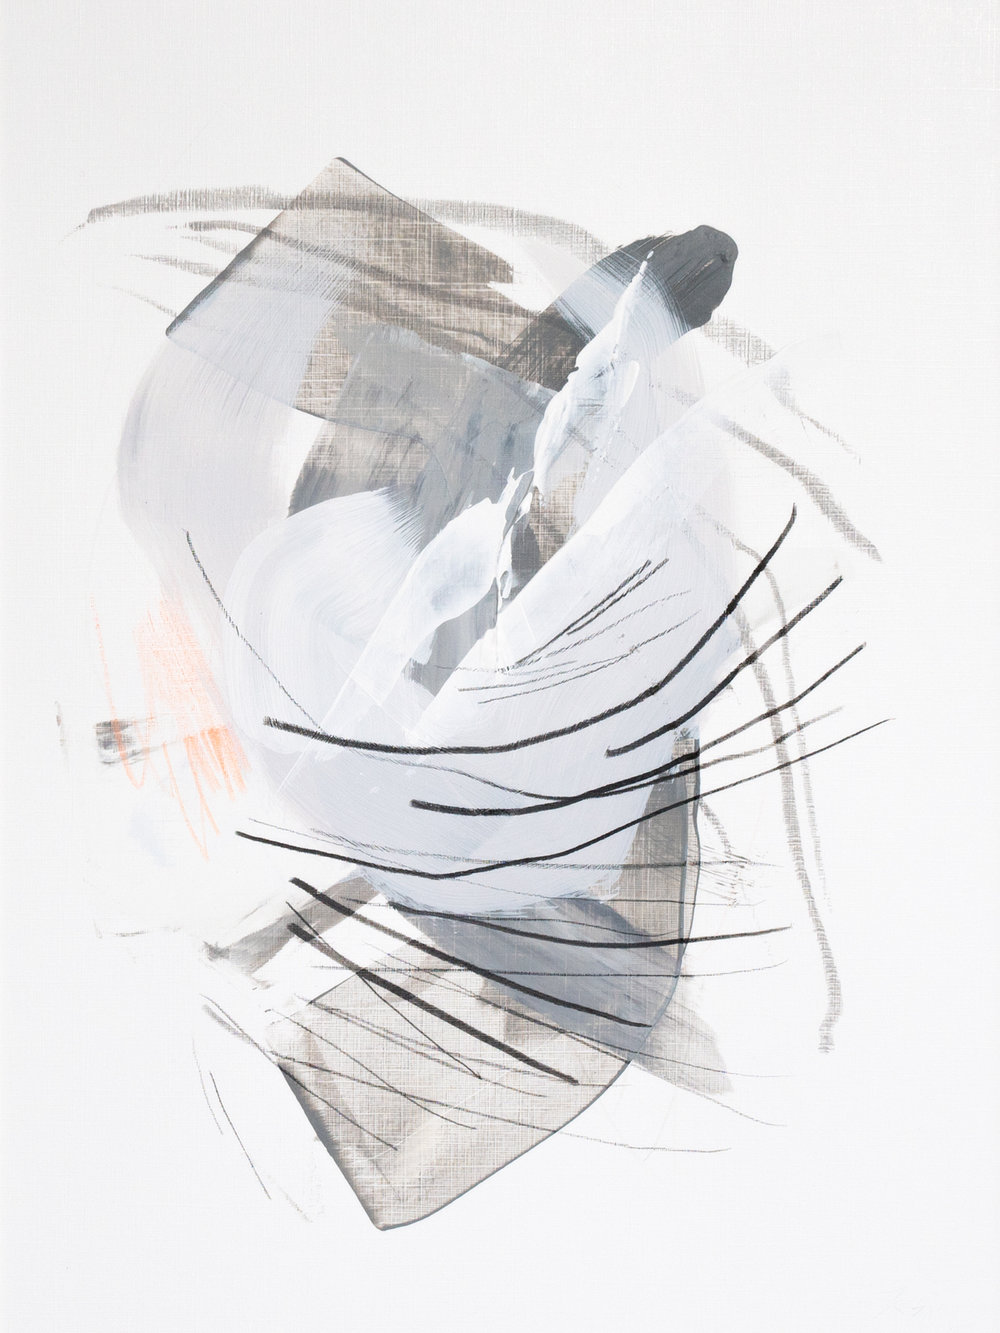 2018_Paintings_RebeccaRuetten_Rehe_2_1-1.jpg